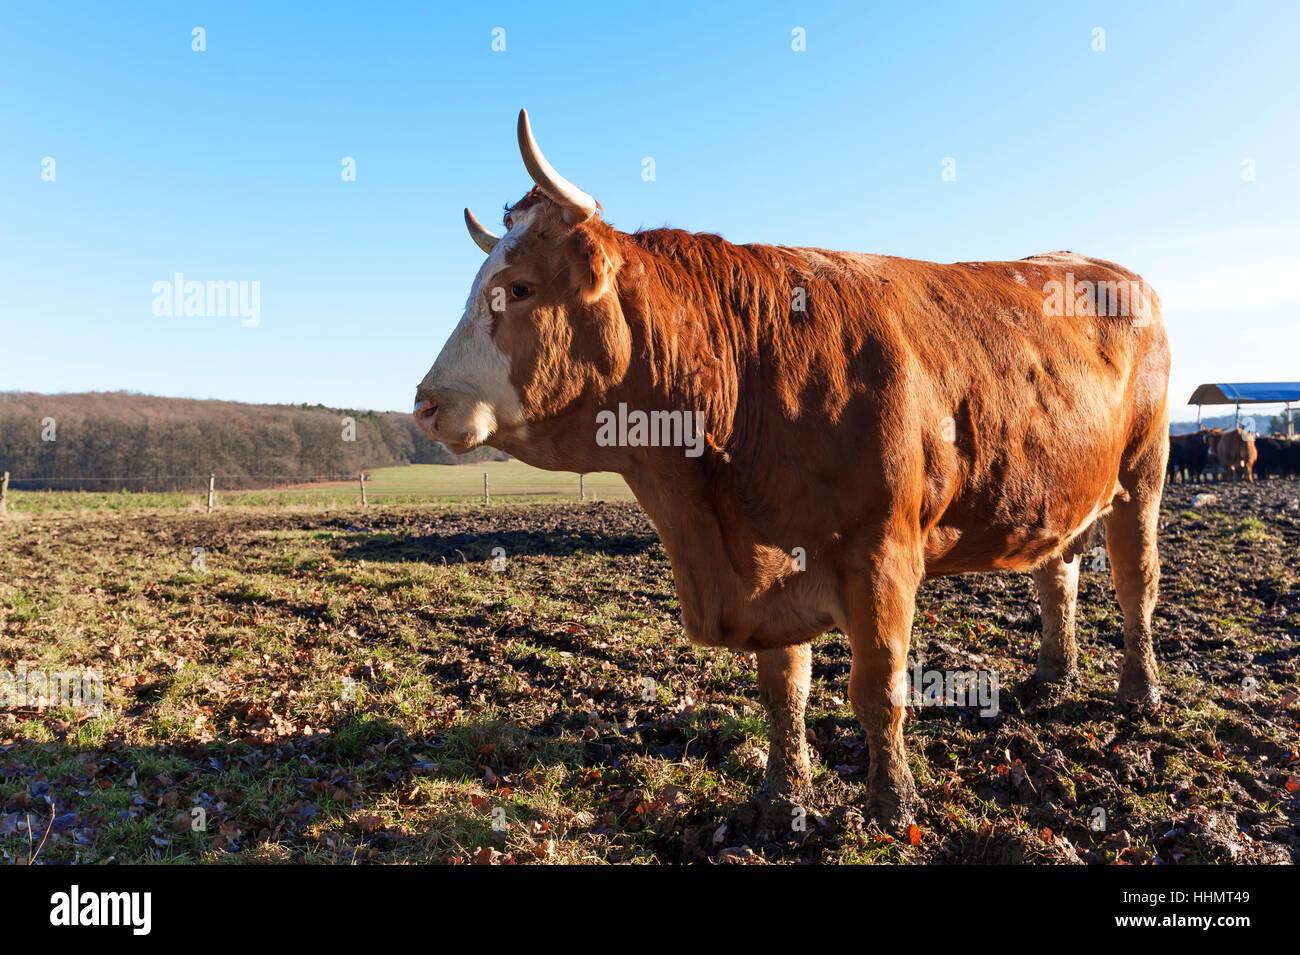 Salers, reddish brown cattle on pasture, Middle Franconia, Bavaria, Germany - Stock Image